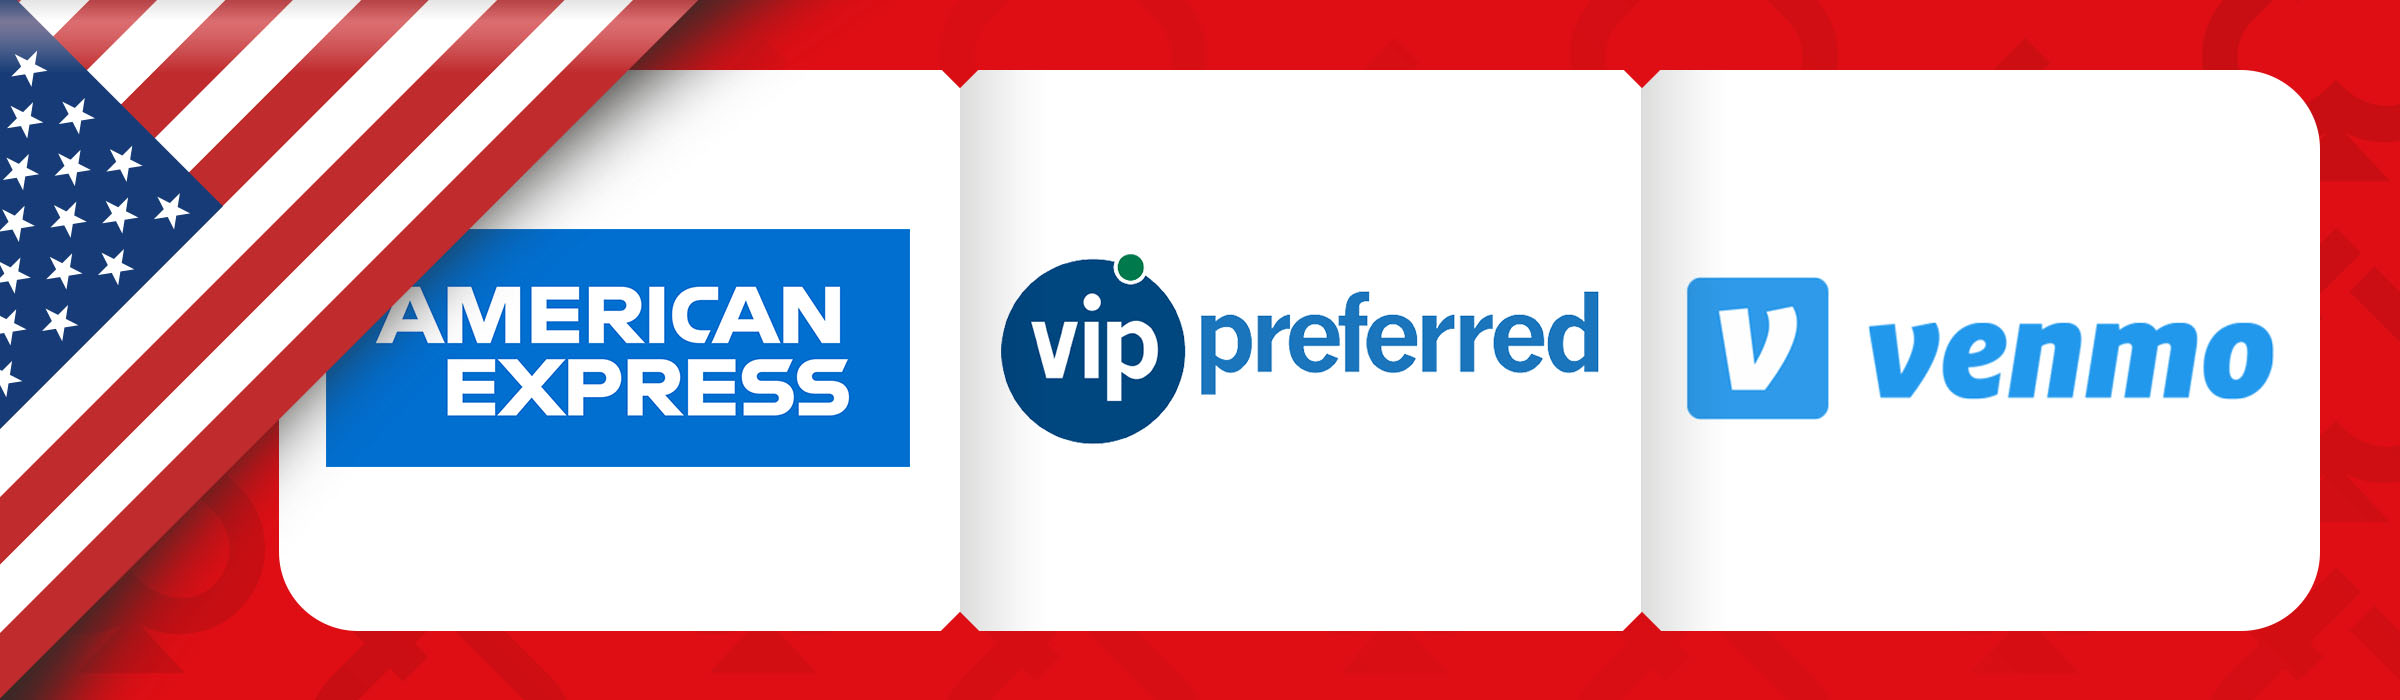 Amex vs VIP Preferred vs Venmo - Which Method Should US Players Use?